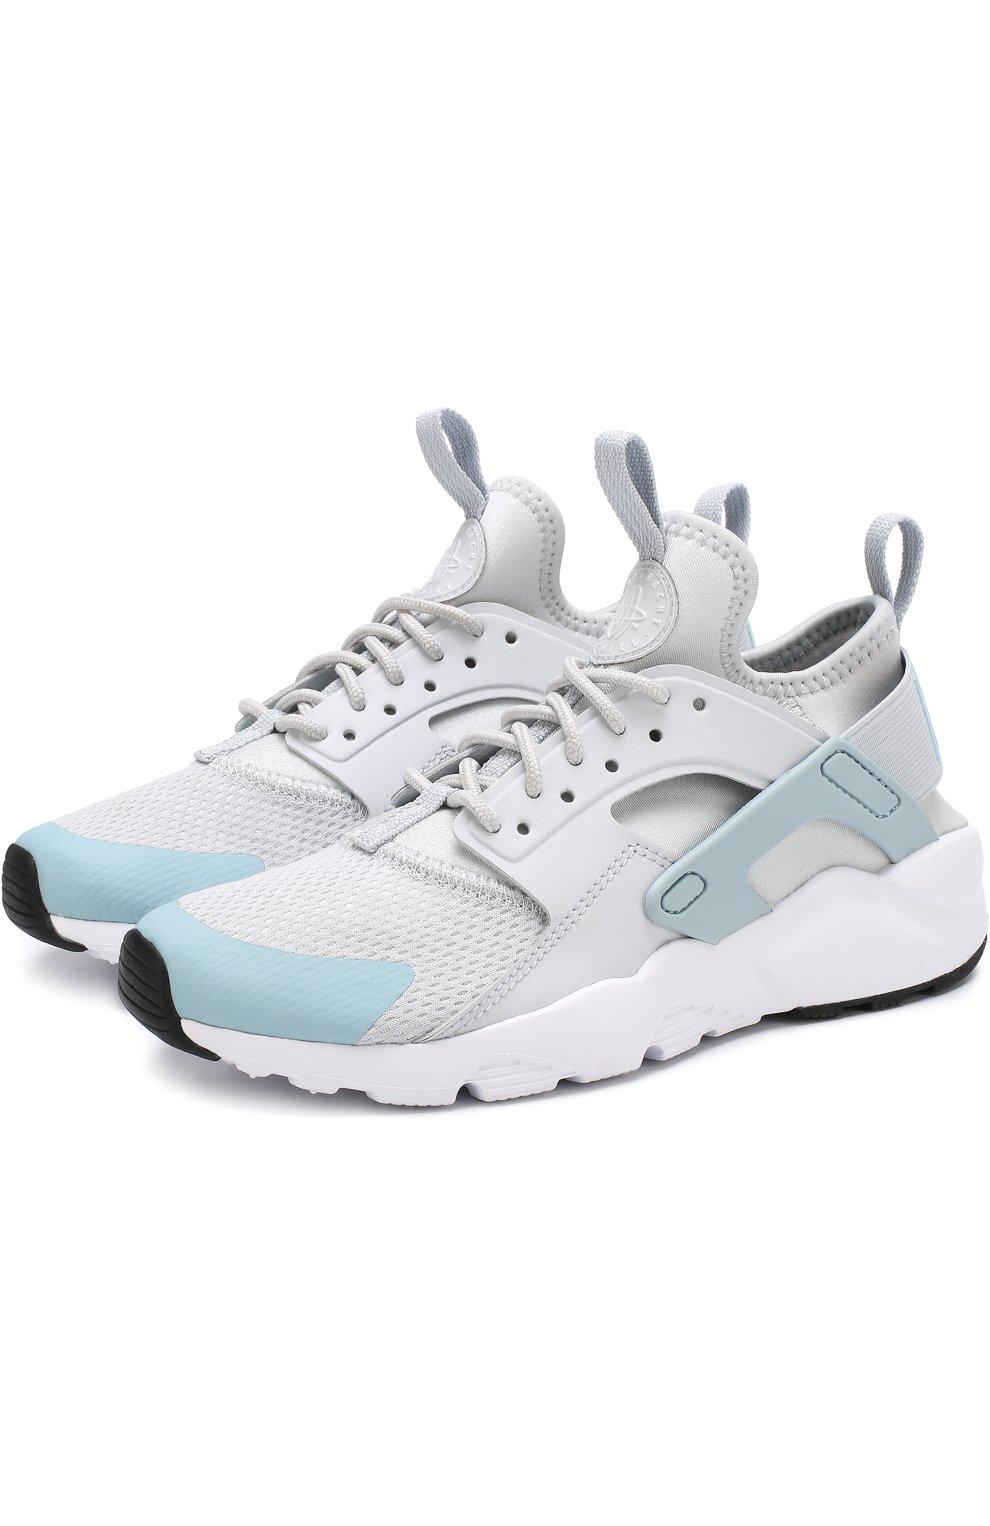 c94b6028 Детские текстильные кроссовки nike air huarache ultra Nike светло-серого  цвета   Фото №1